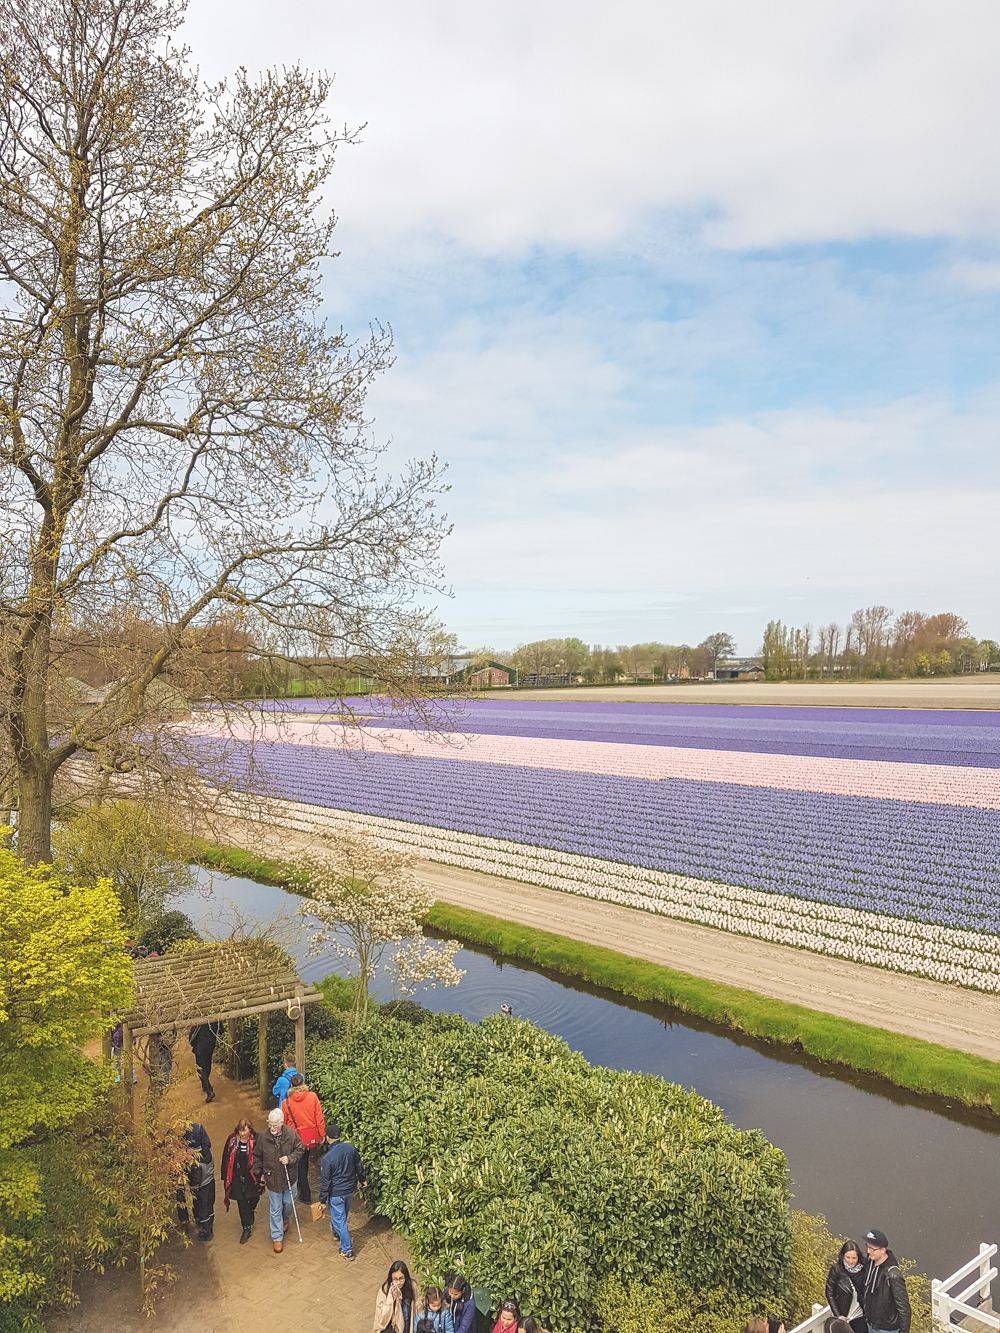 Field of Hyacinths at Keukenhof Gardens, Holland